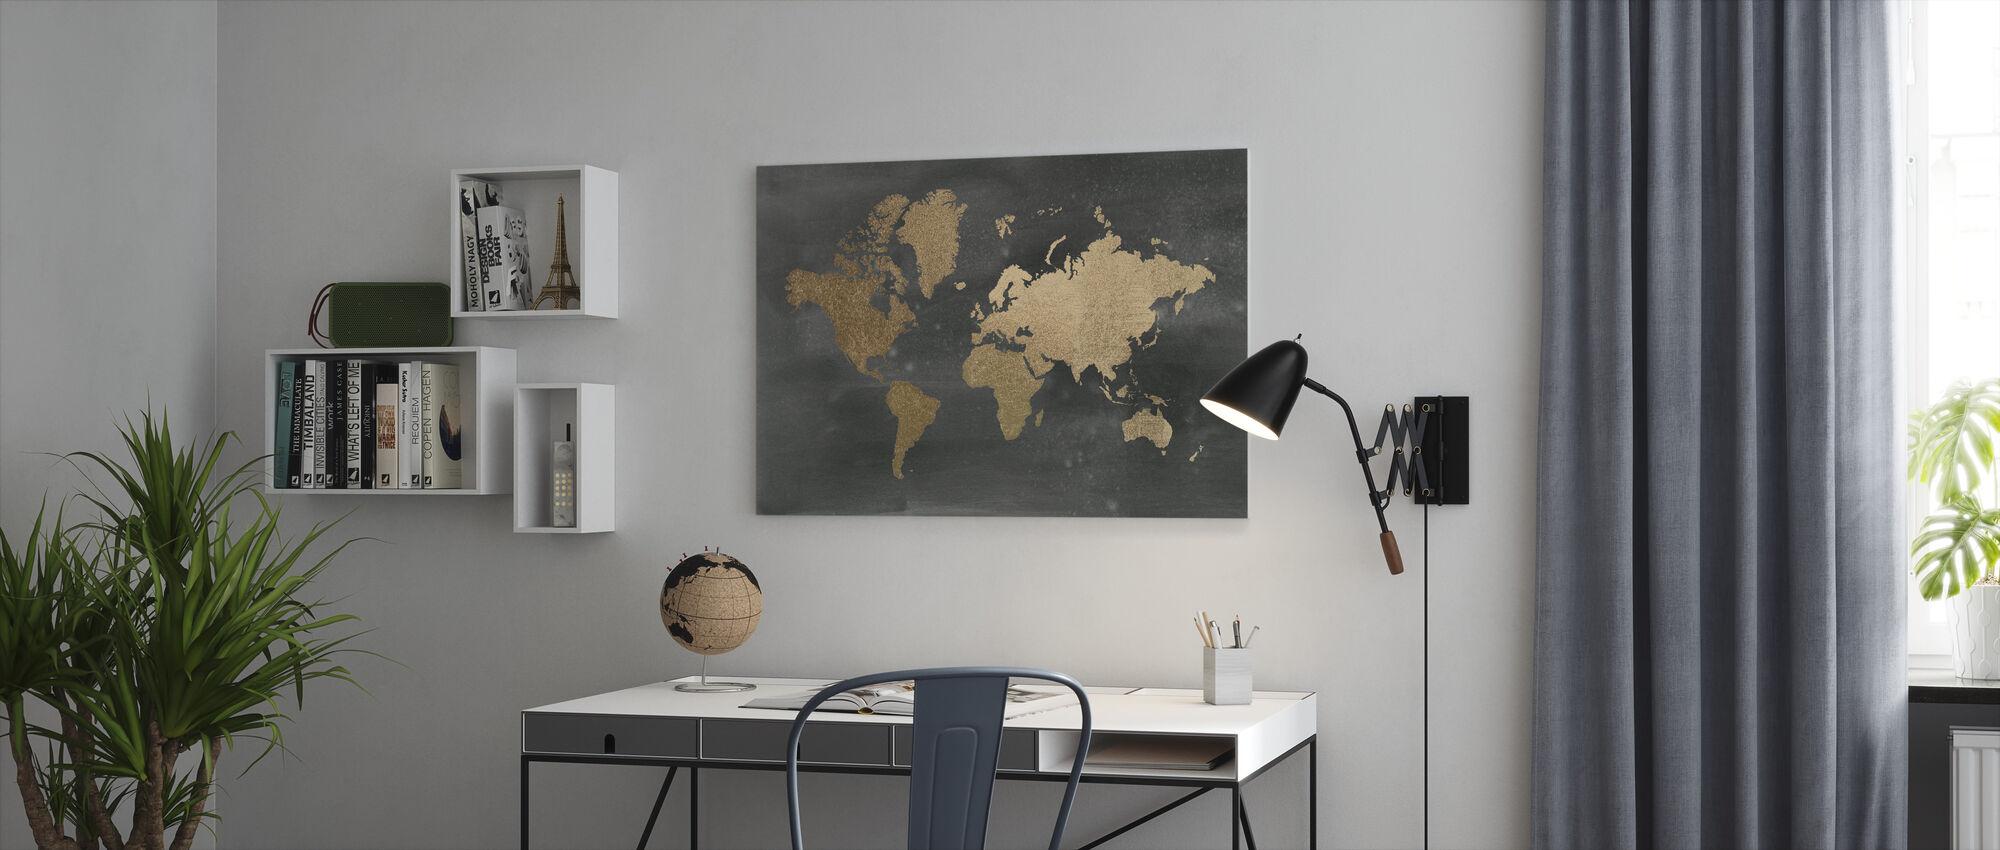 World Map on Black Wash - Canvas print - Office